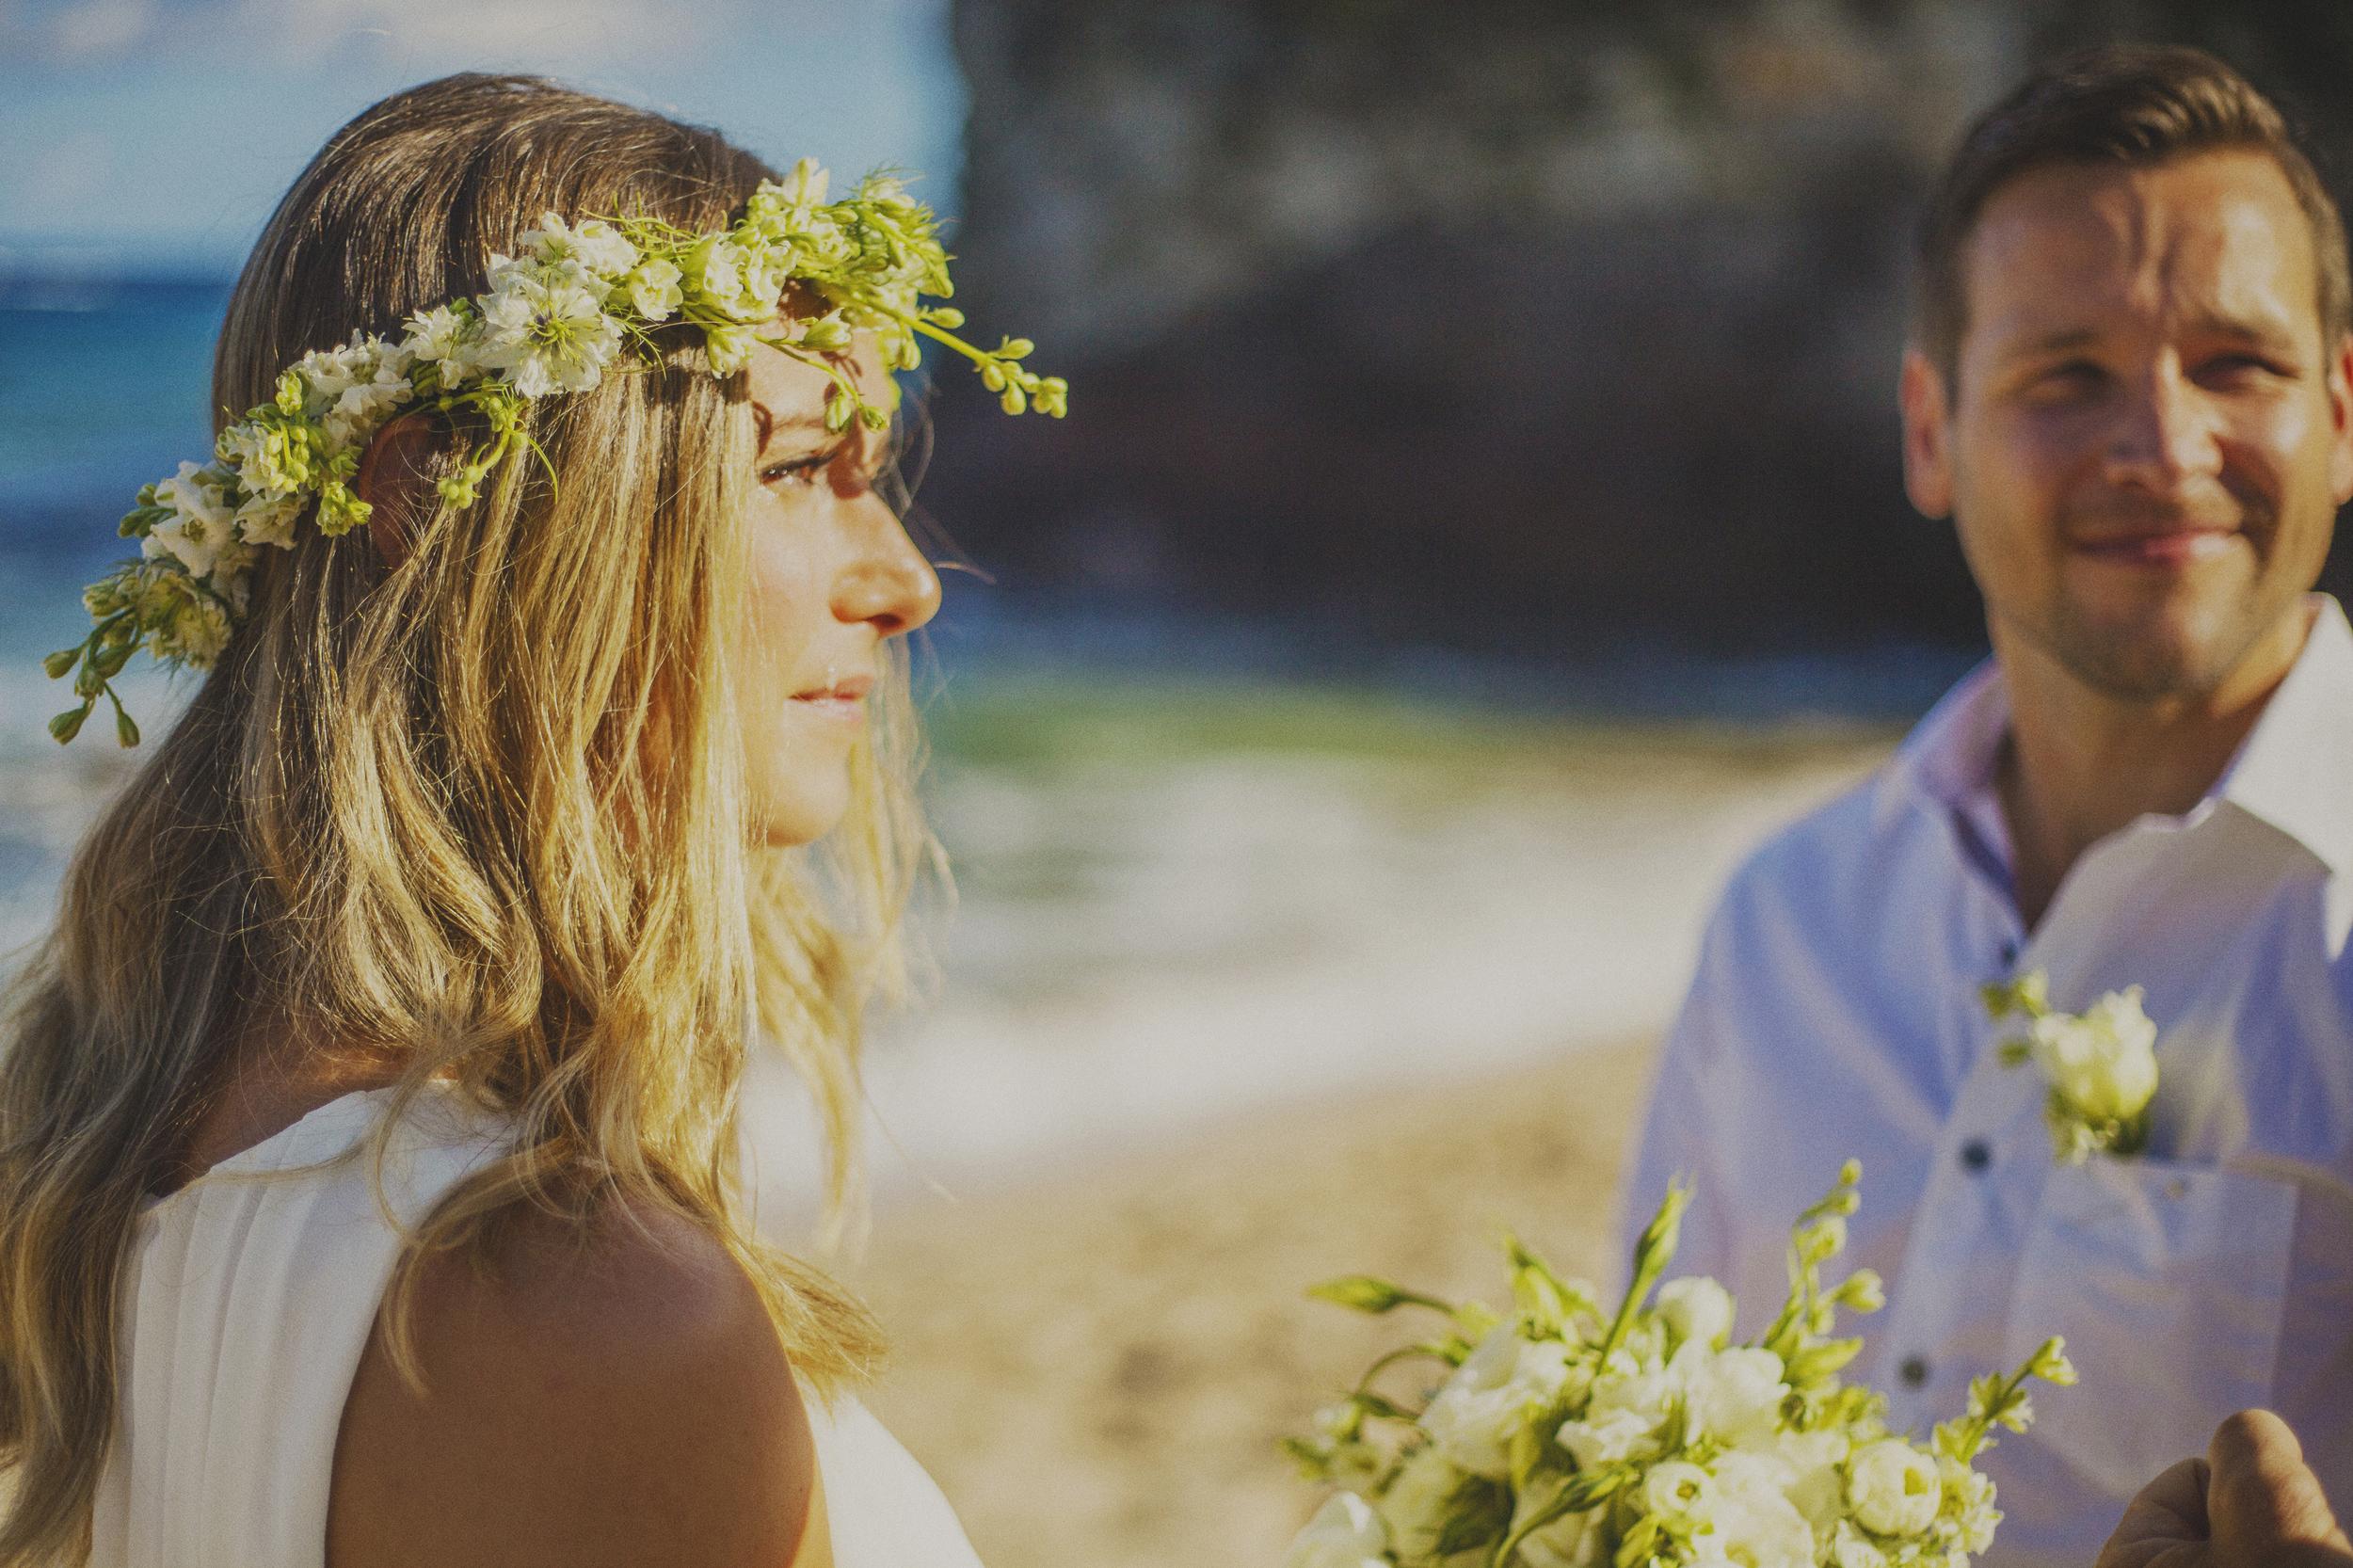 angie-diaz-photography-maui-elopement-oneloa-ironwoods-beach-7.jpg